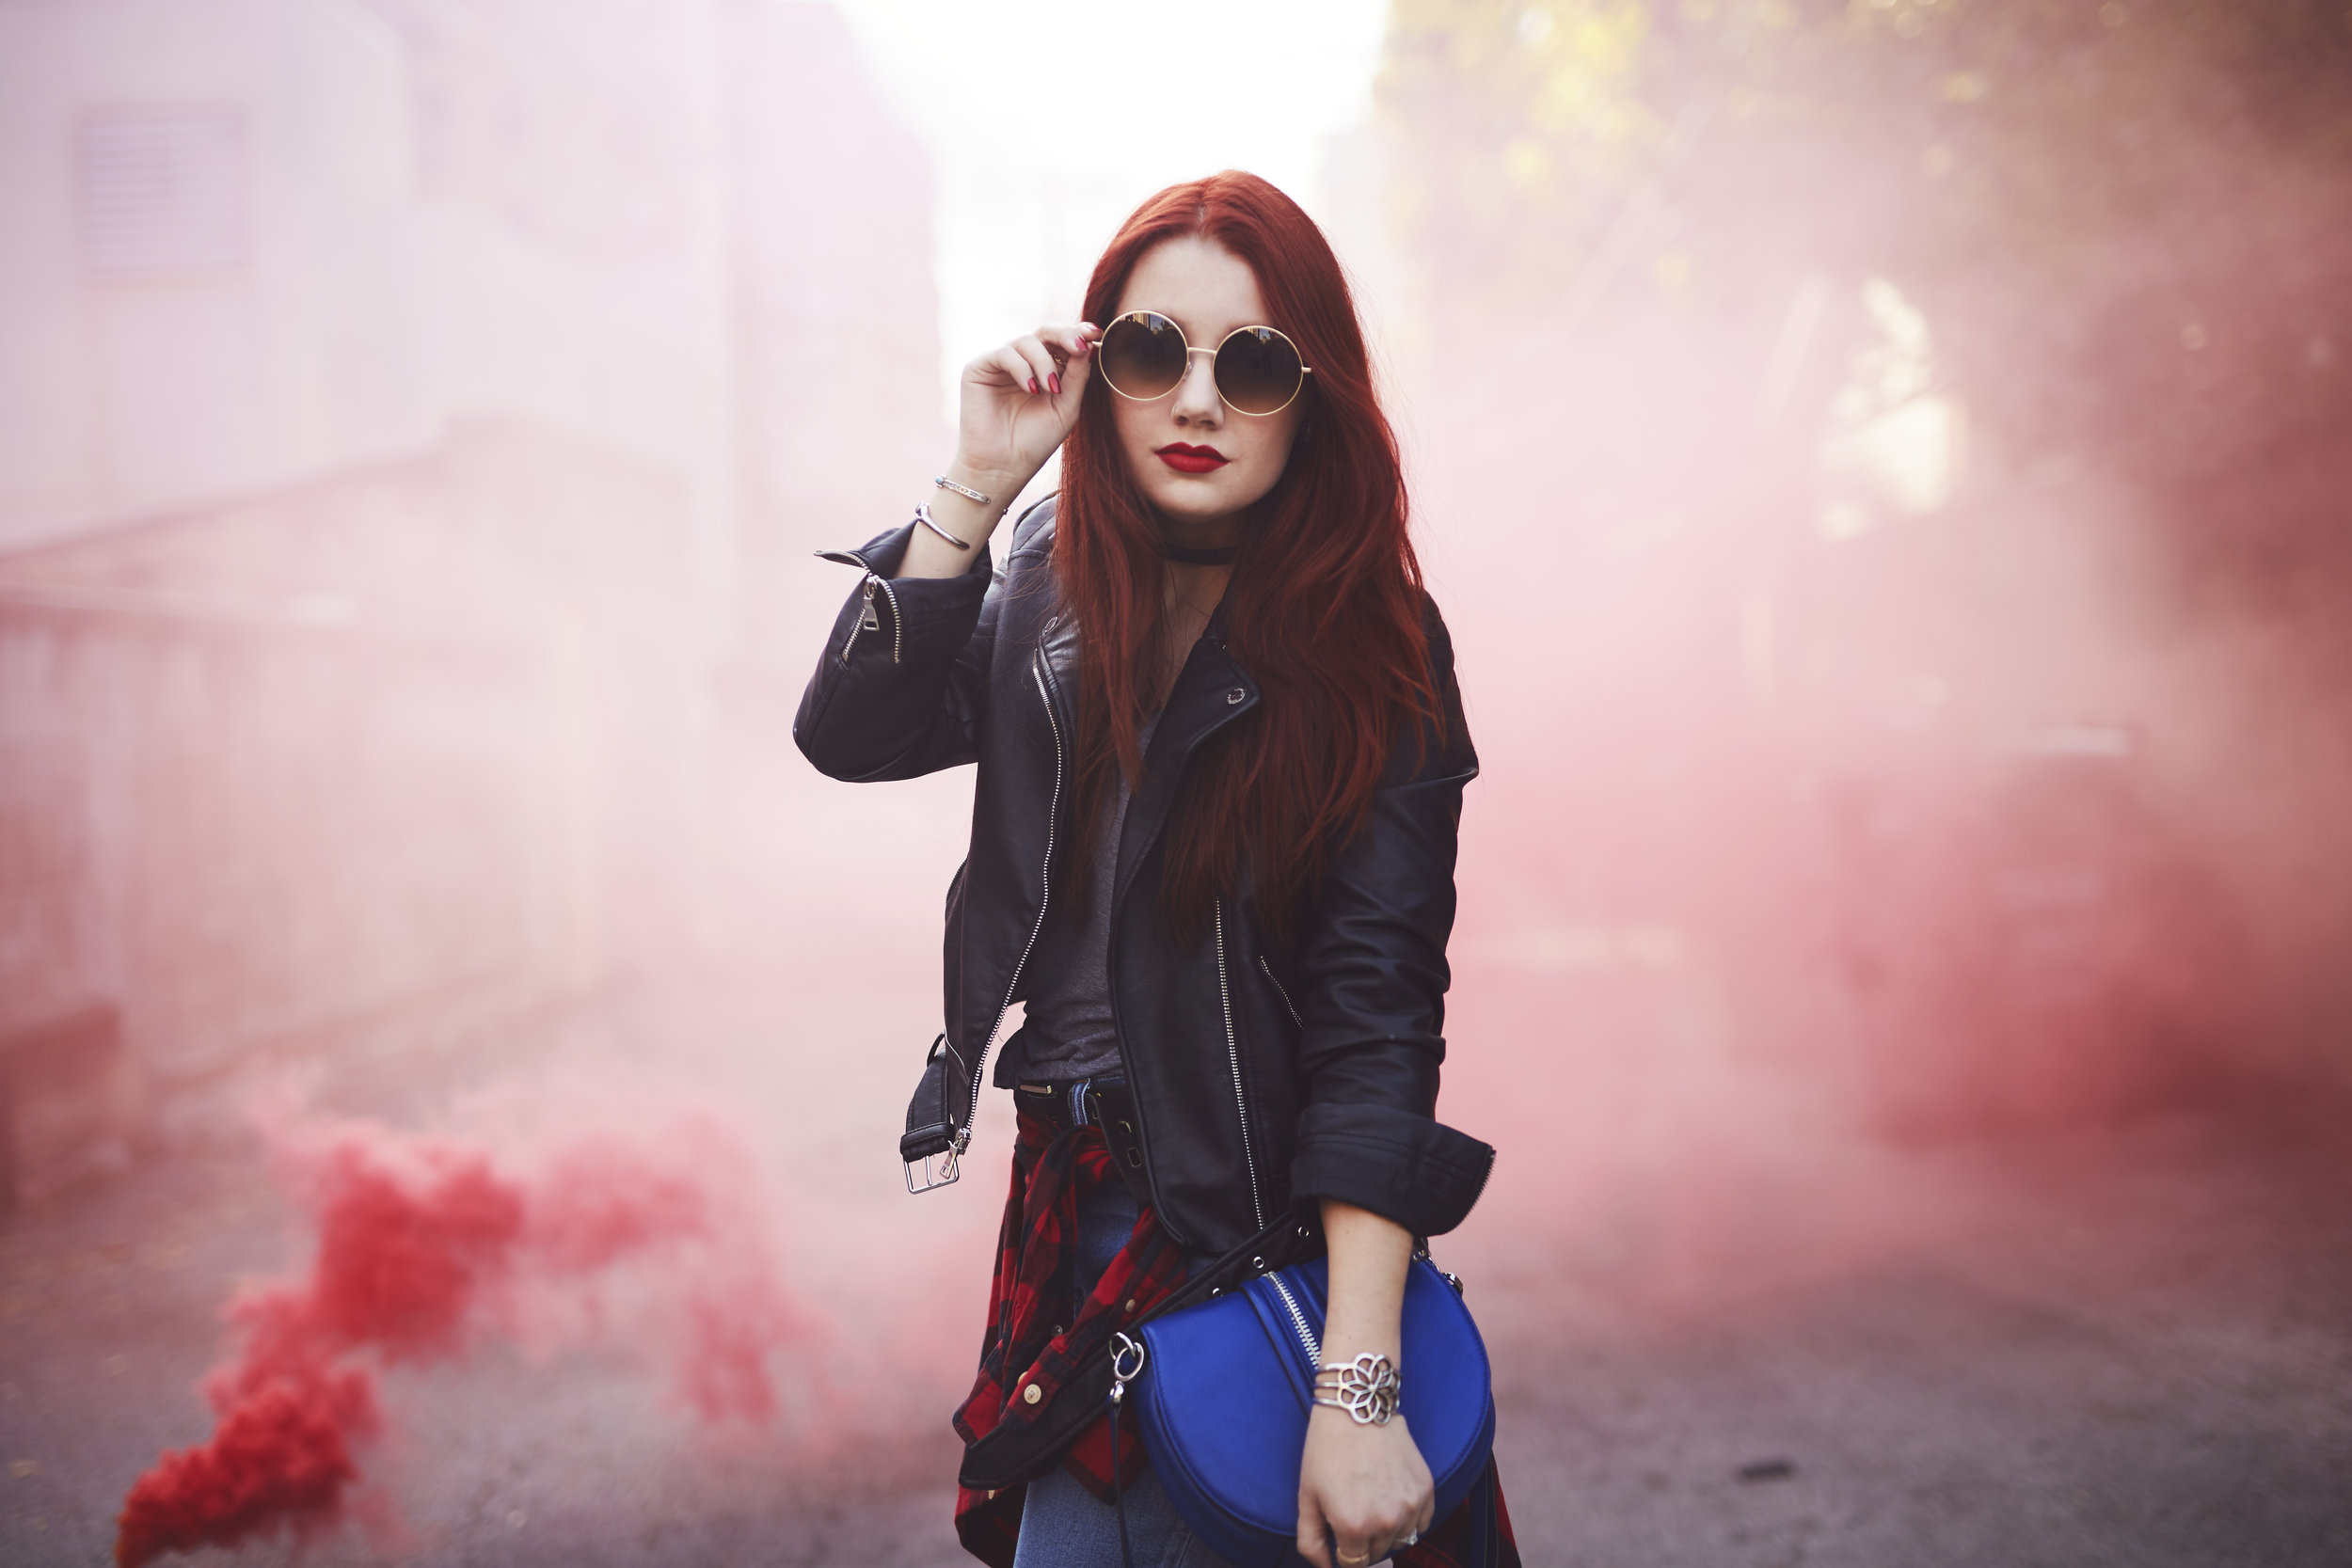 St. Louis style blogger smoke bomb portrait